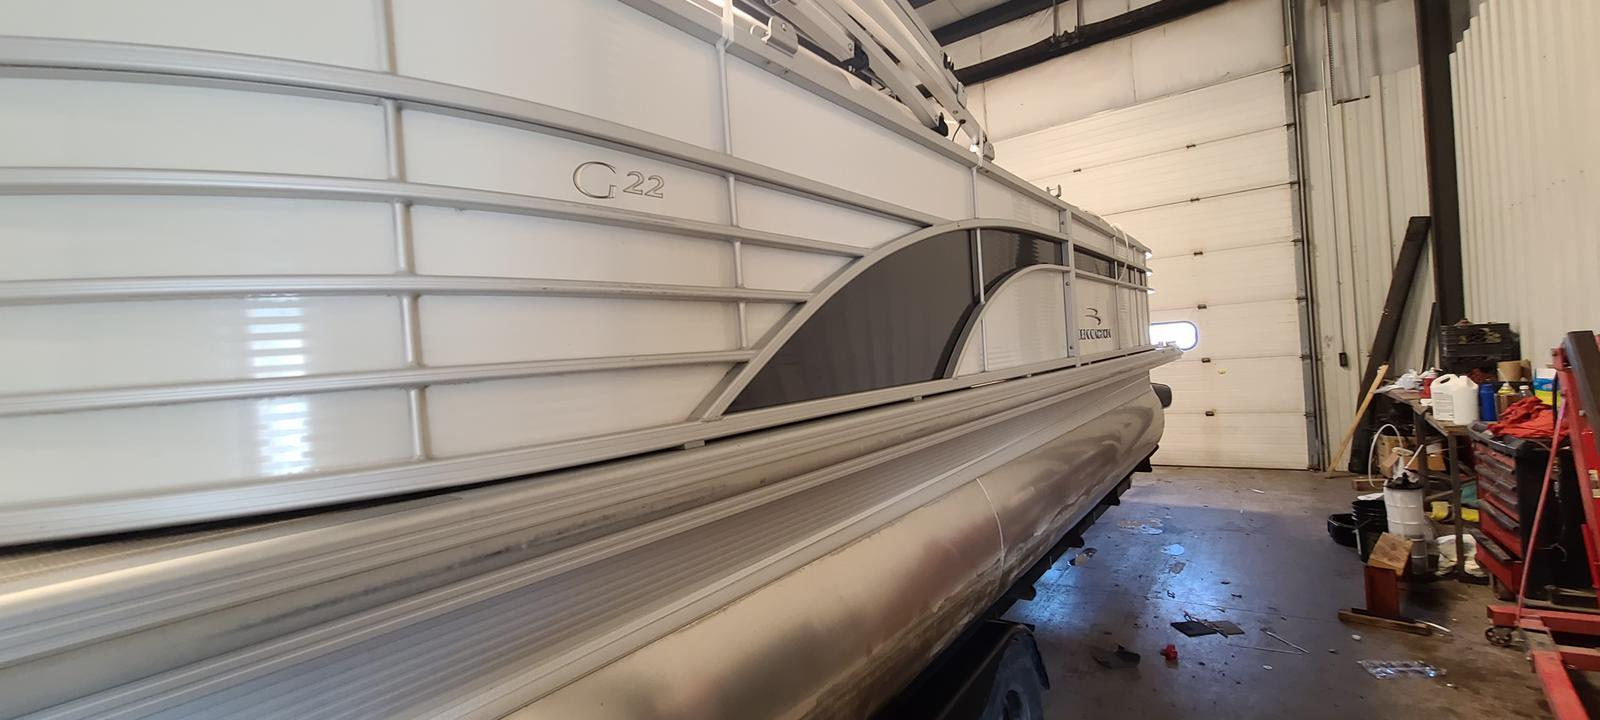 2016 Bennington boat for sale, model of the boat is 2250 GSR & Image # 4 of 6